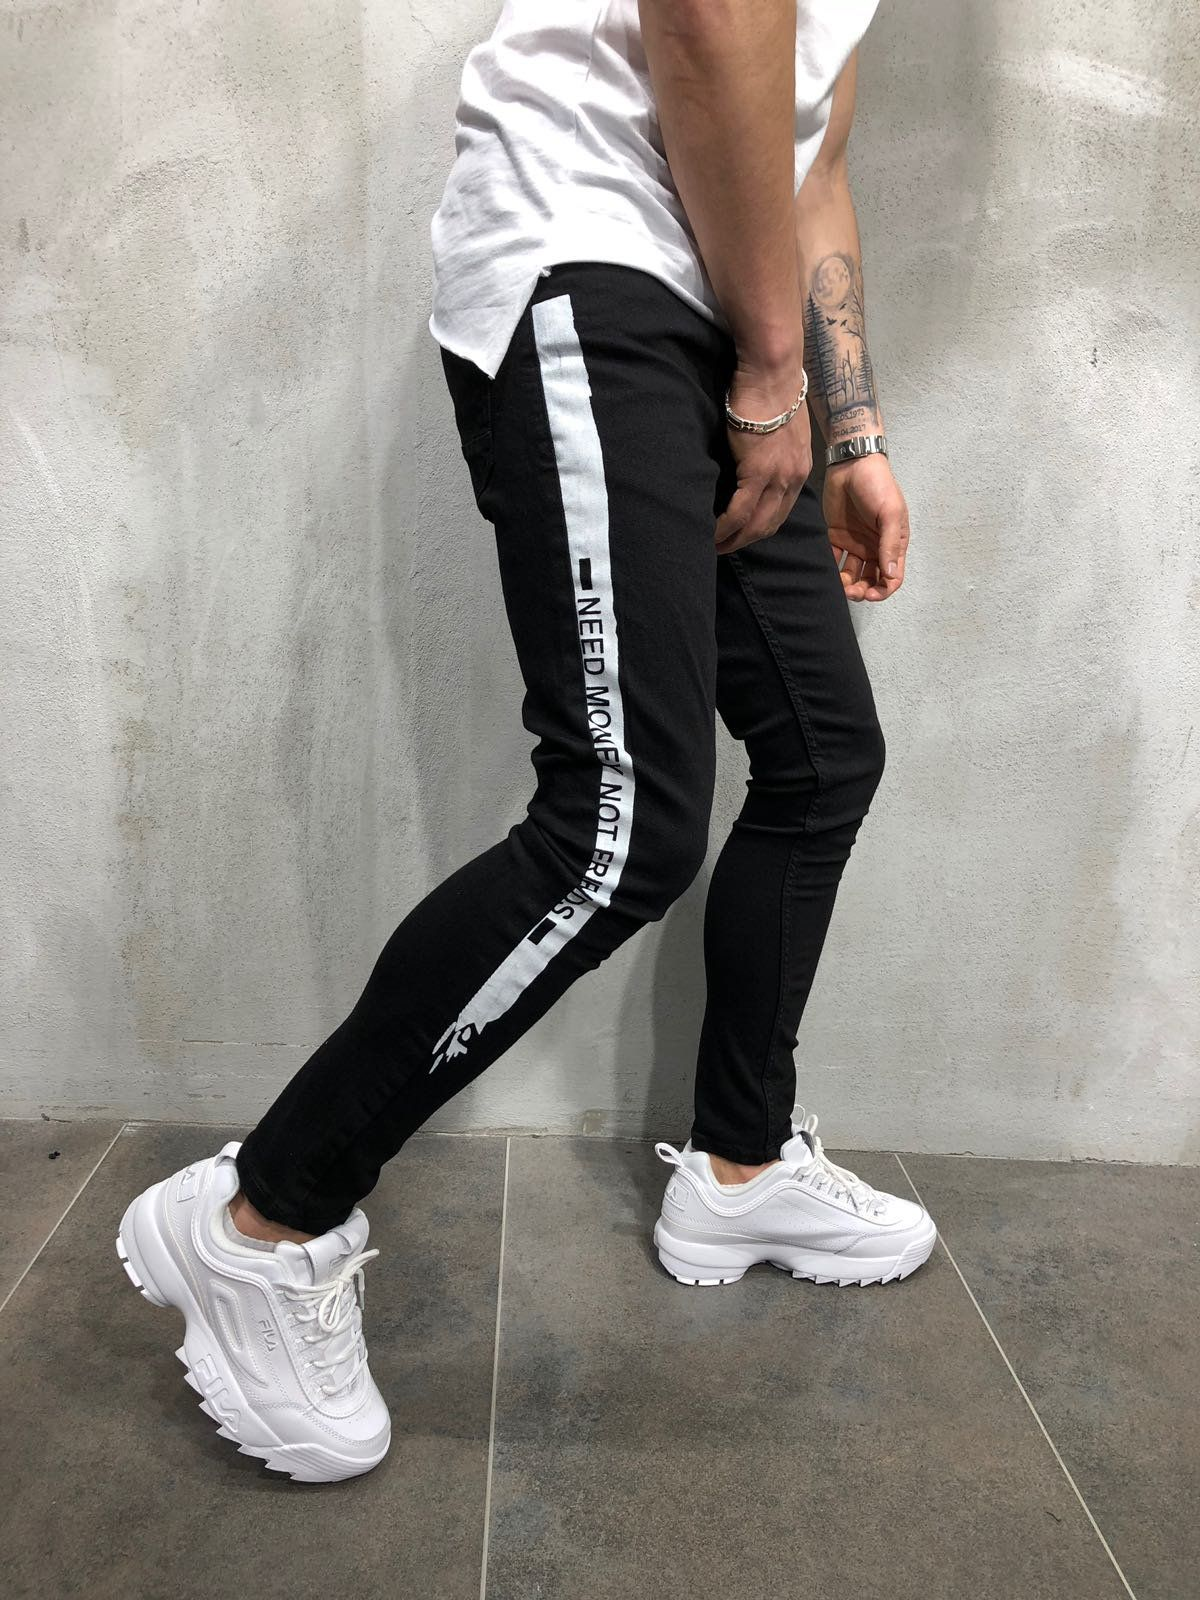 28b41432aae Side Stripe Skinny Jeans - Black/White . . . . #Stripejeans #skinnyfit  #StreetwearStyle